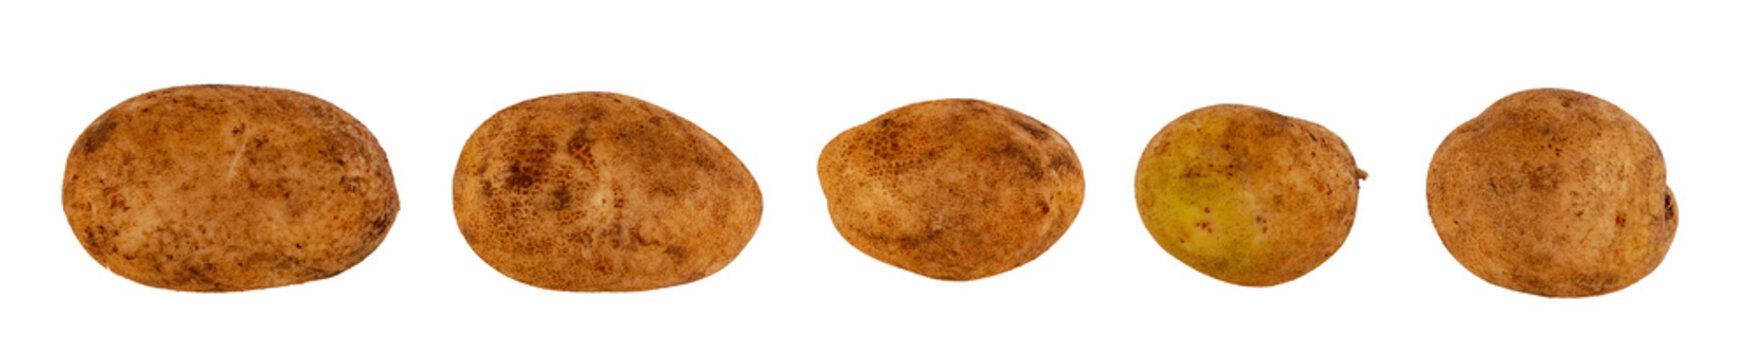 Untreated potato tubers white background